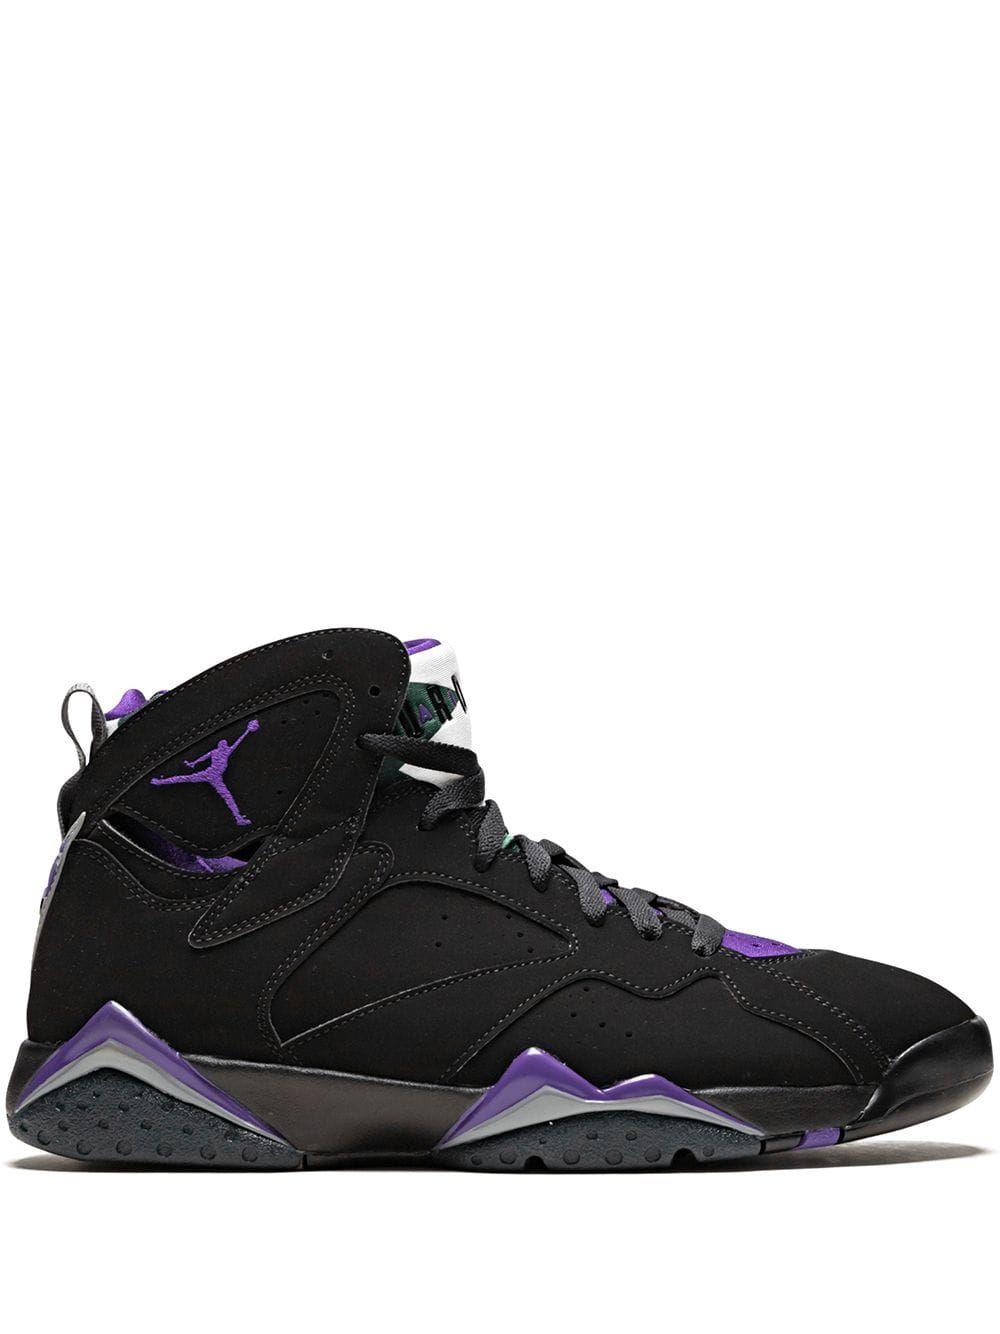 Jordan Air Jordan 7 Retro sneakers Black em 2020 | Calça